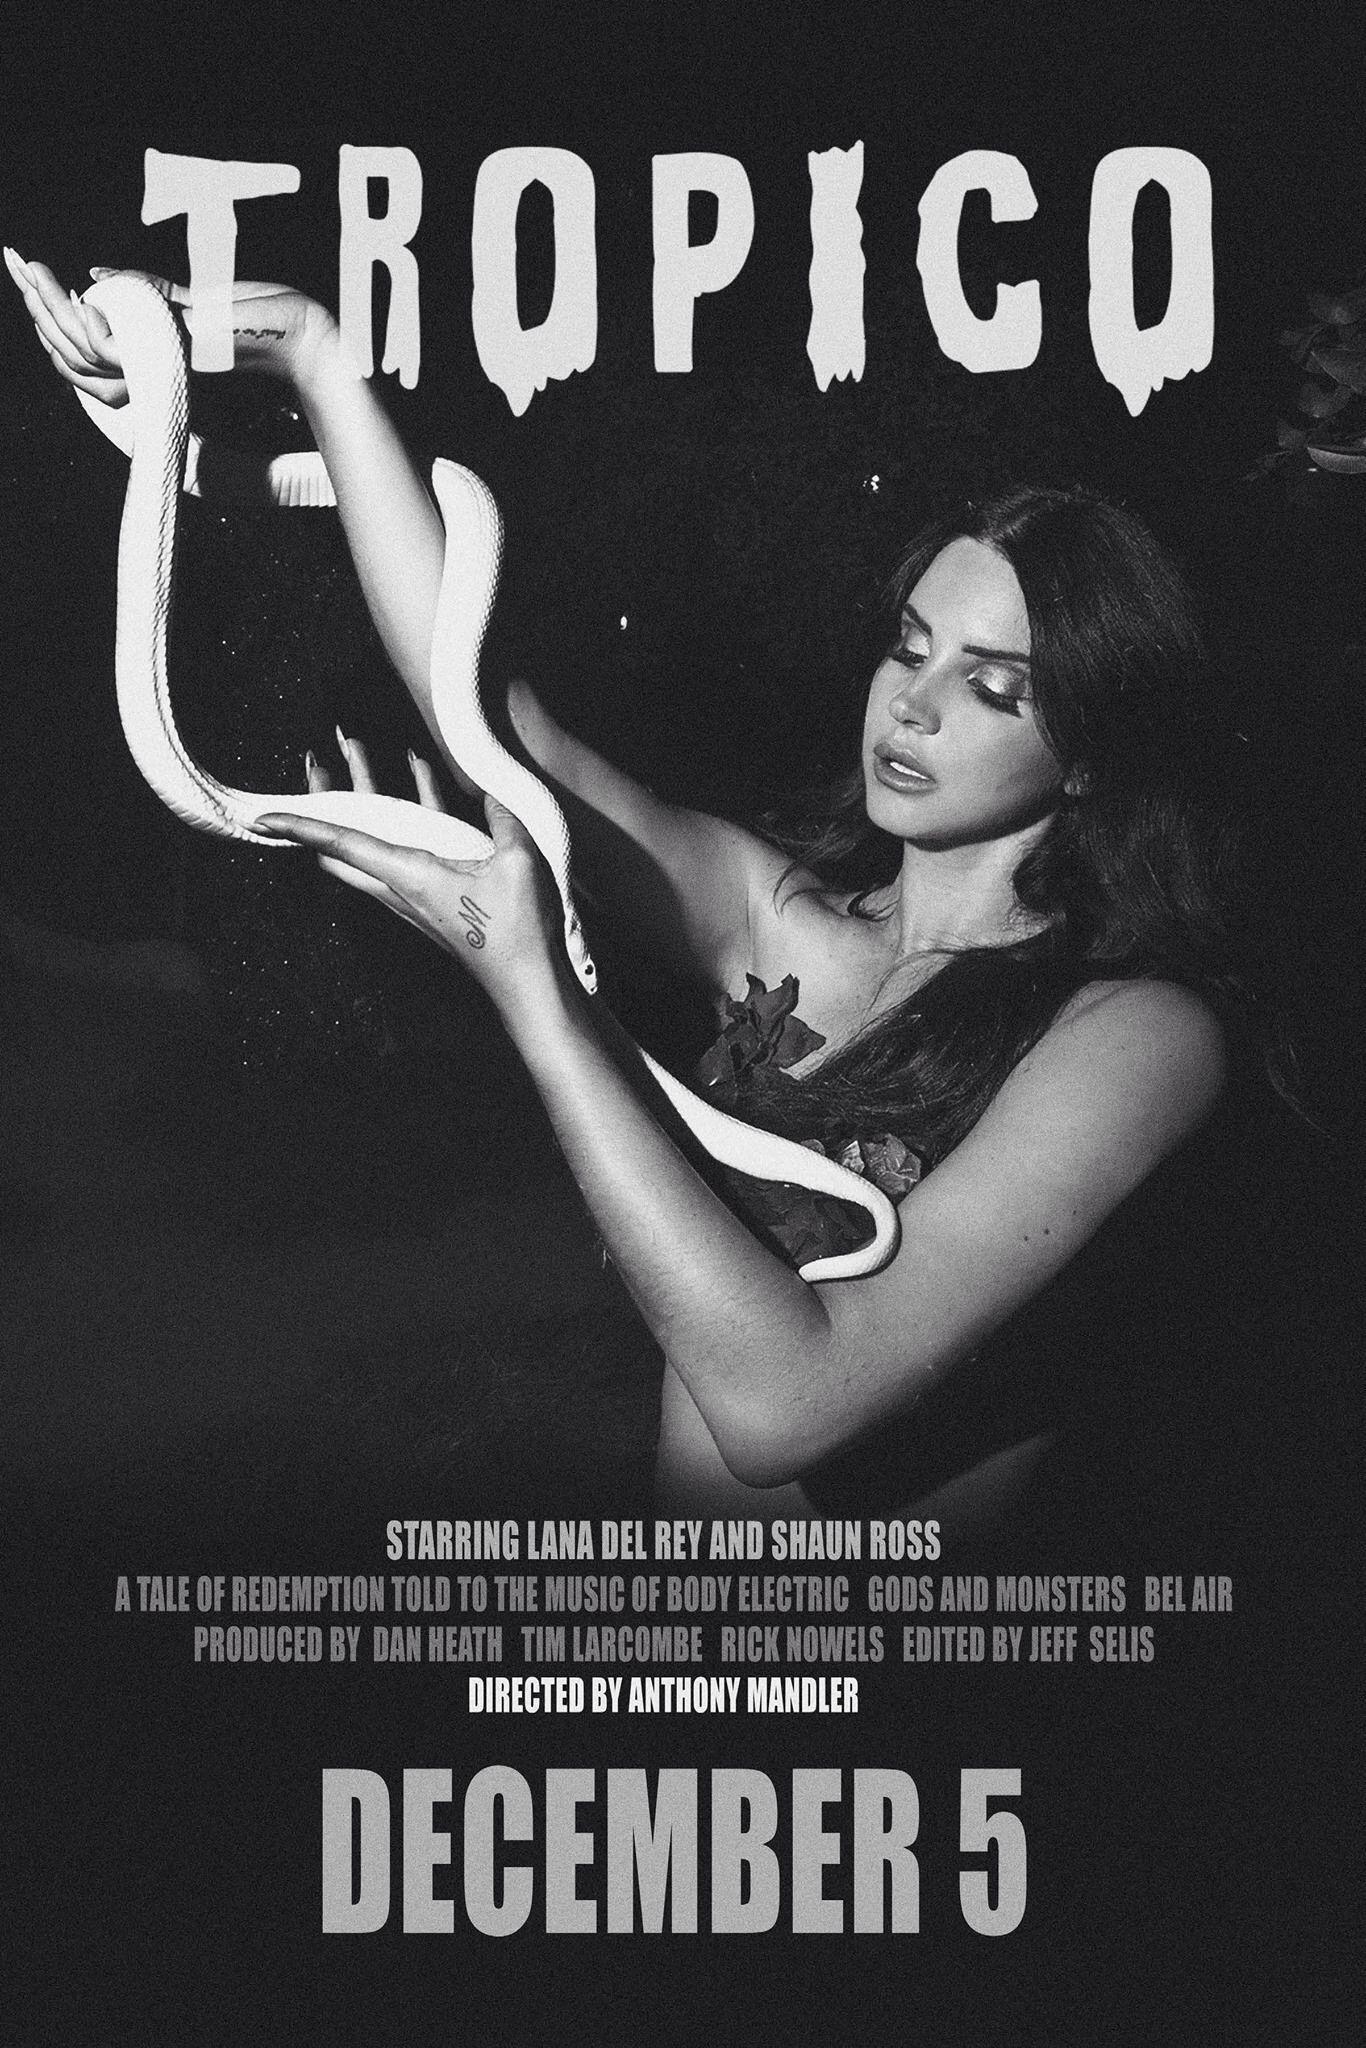 Tropico Poster With Lana Del Rey Shaun Ross Lana Del Rey Lyrics Lana Del Rey